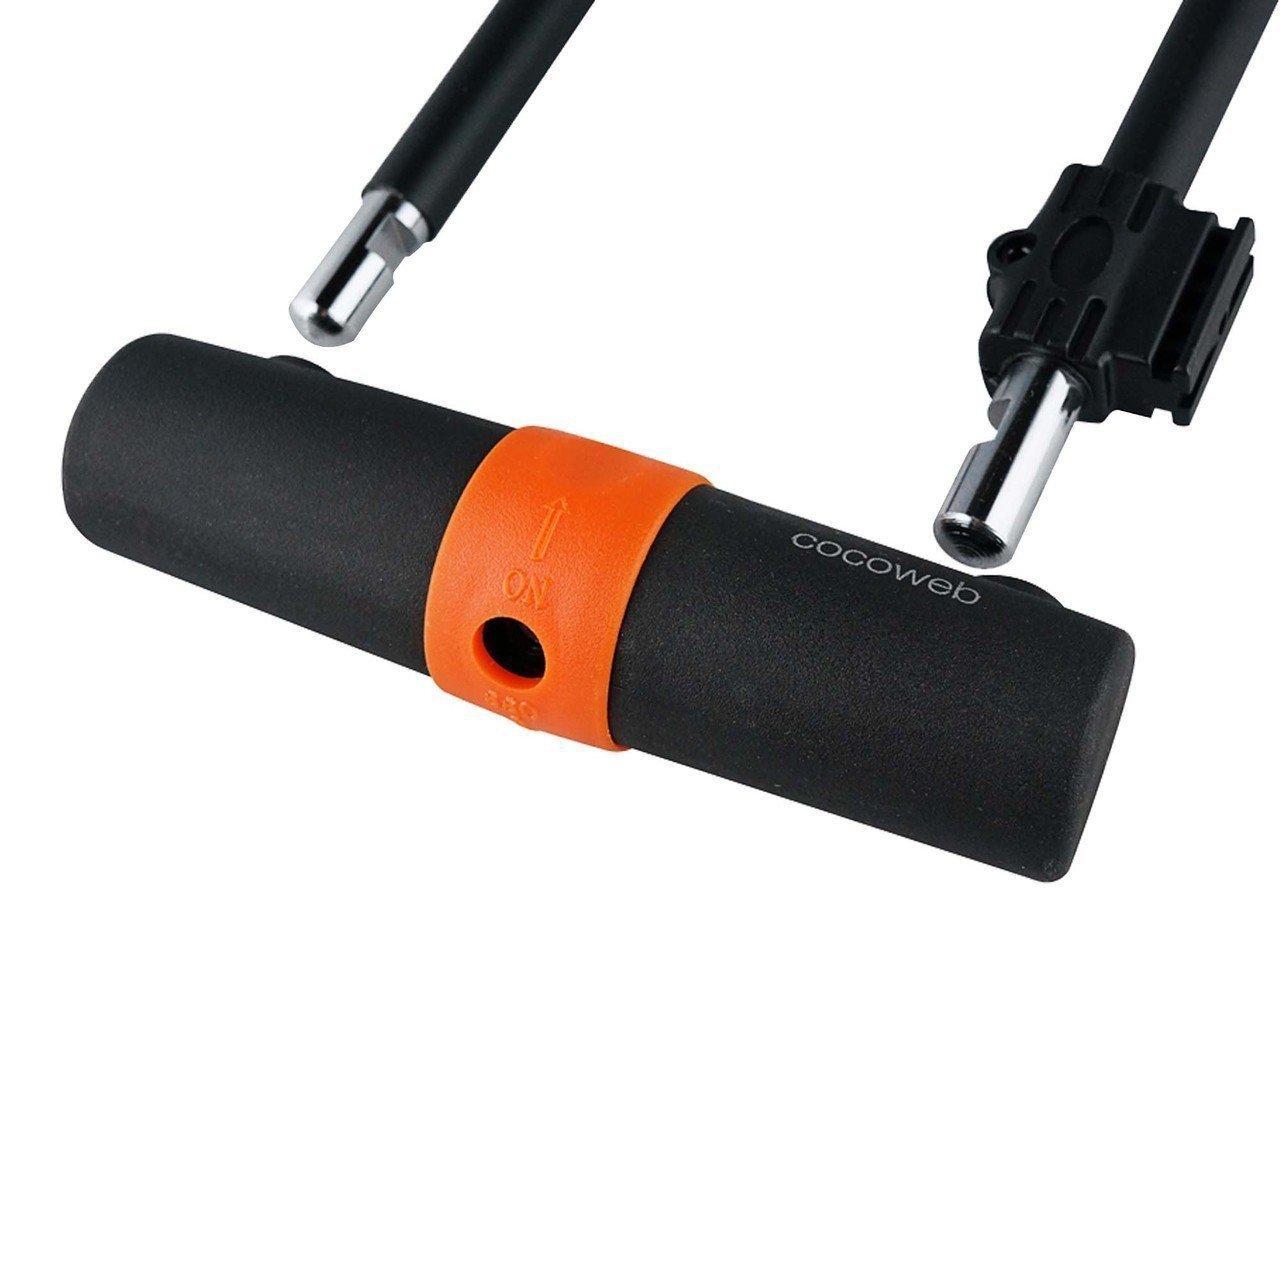 Cocoweb Sport Armbar Curl U-Lock and Bike Flex Loop Cable